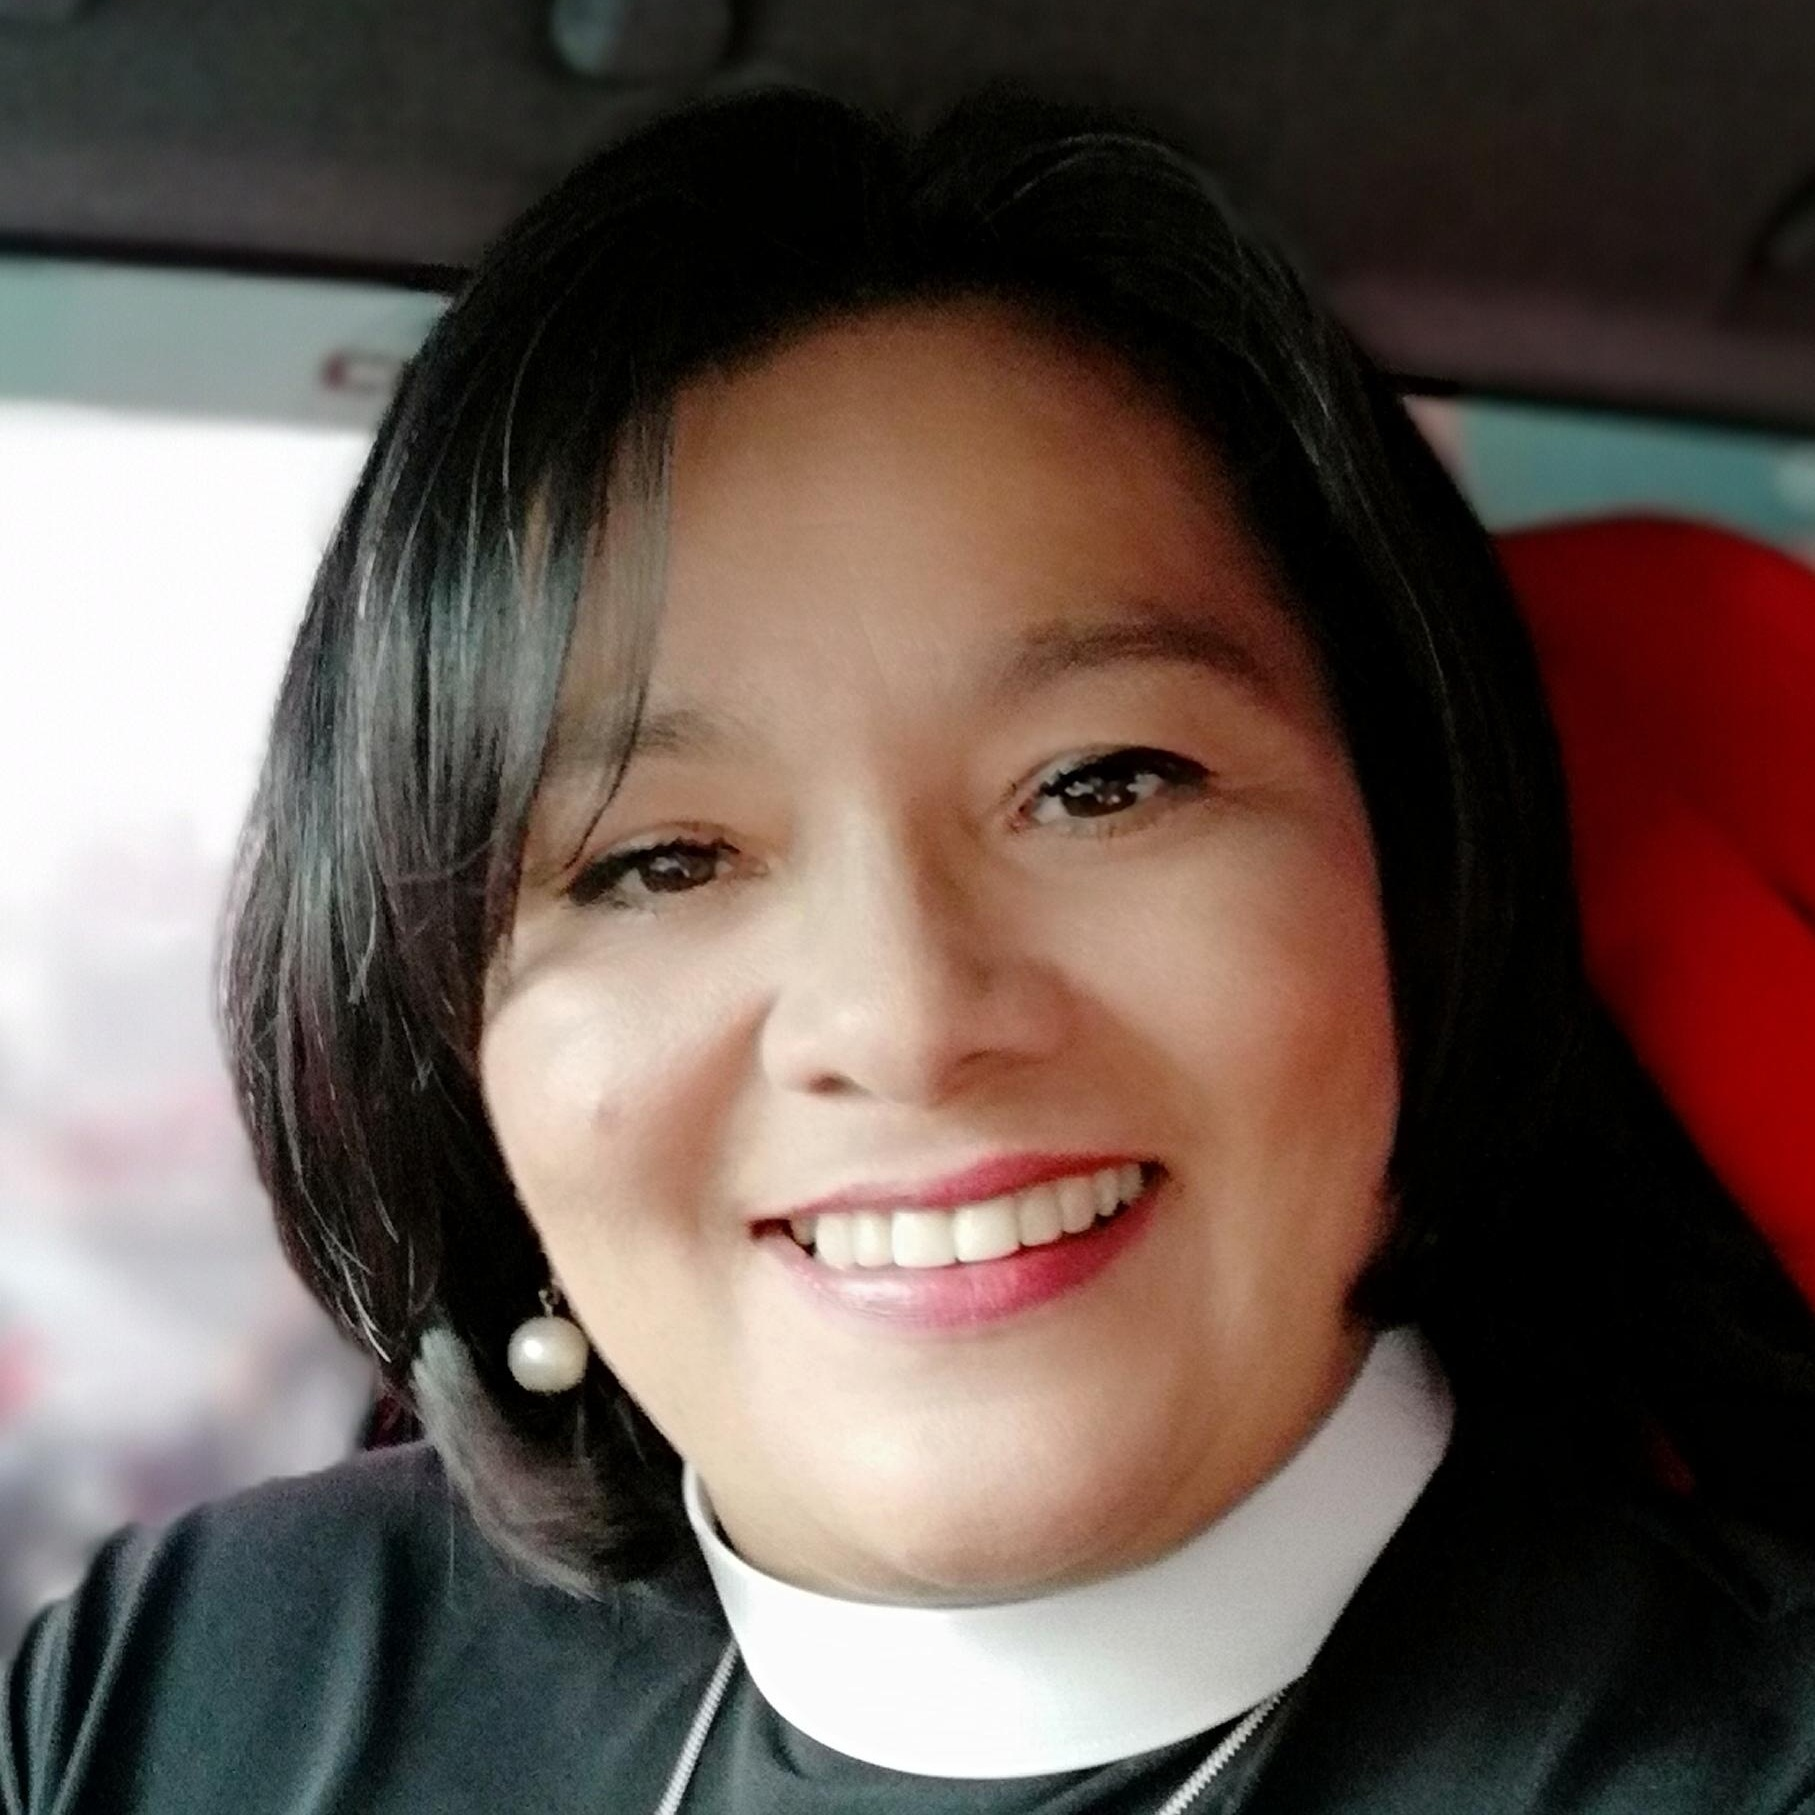 Mrs. Karla Reyes - Vice Rectorkarlareyes@episcopalhn.org